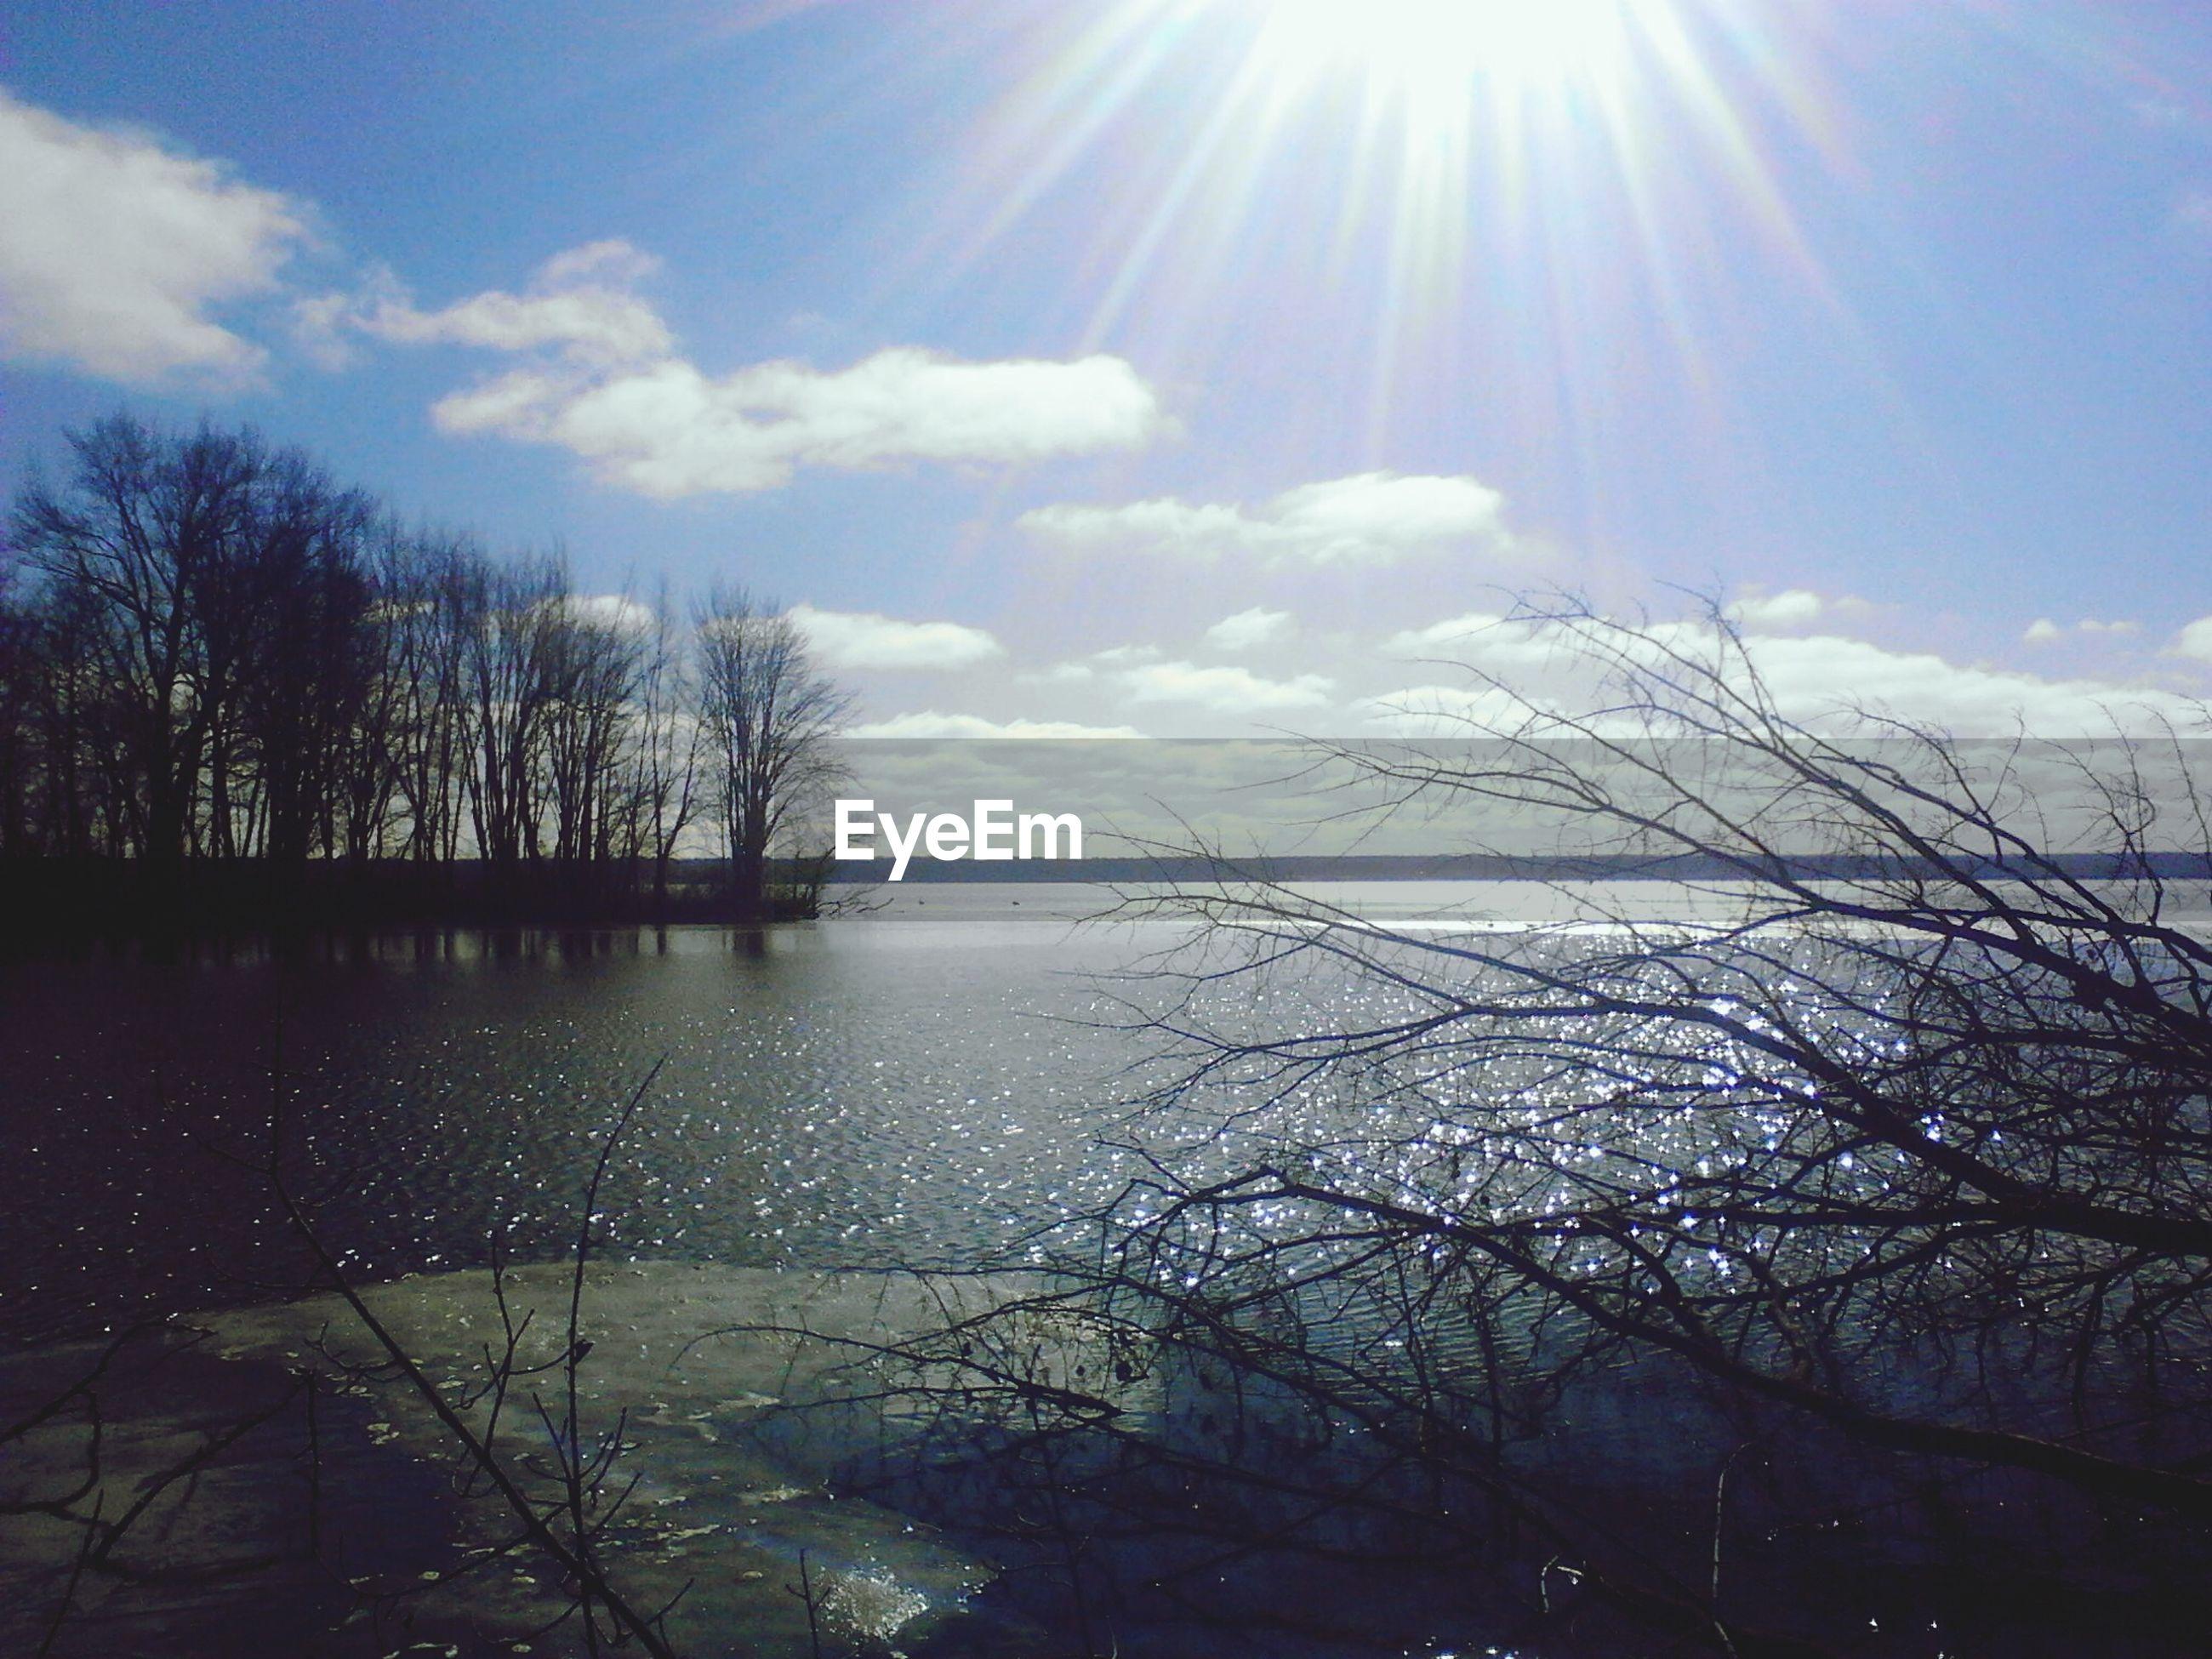 sun, sunbeam, water, sunlight, tranquility, tranquil scene, beauty in nature, scenics, tree, sky, lens flare, nature, bare tree, reflection, lake, sunny, idyllic, branch, day, bright